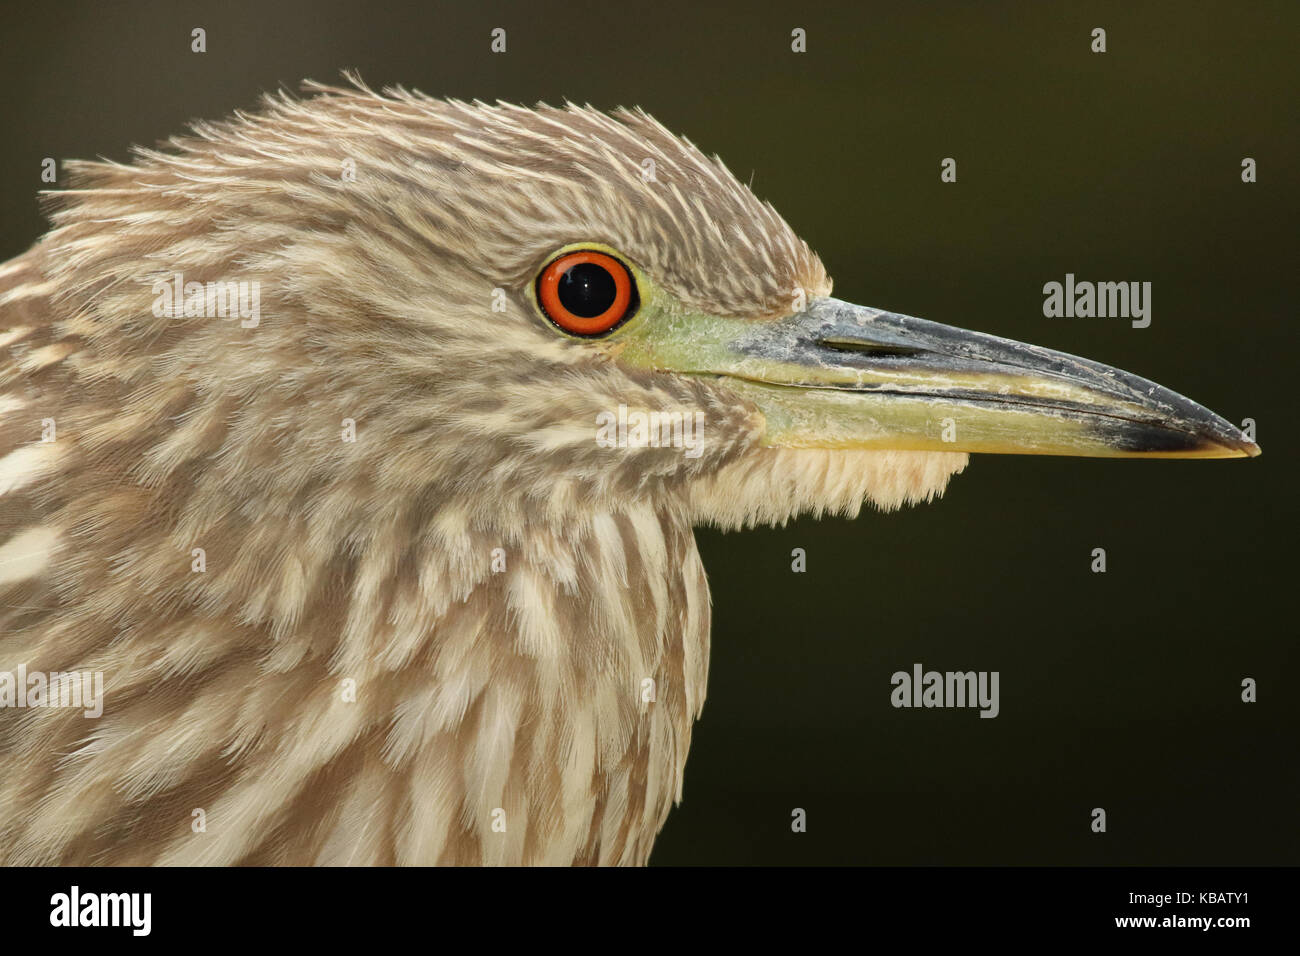 Detailed Eye Stockfotos & Detailed Eye Bilder - Alamy